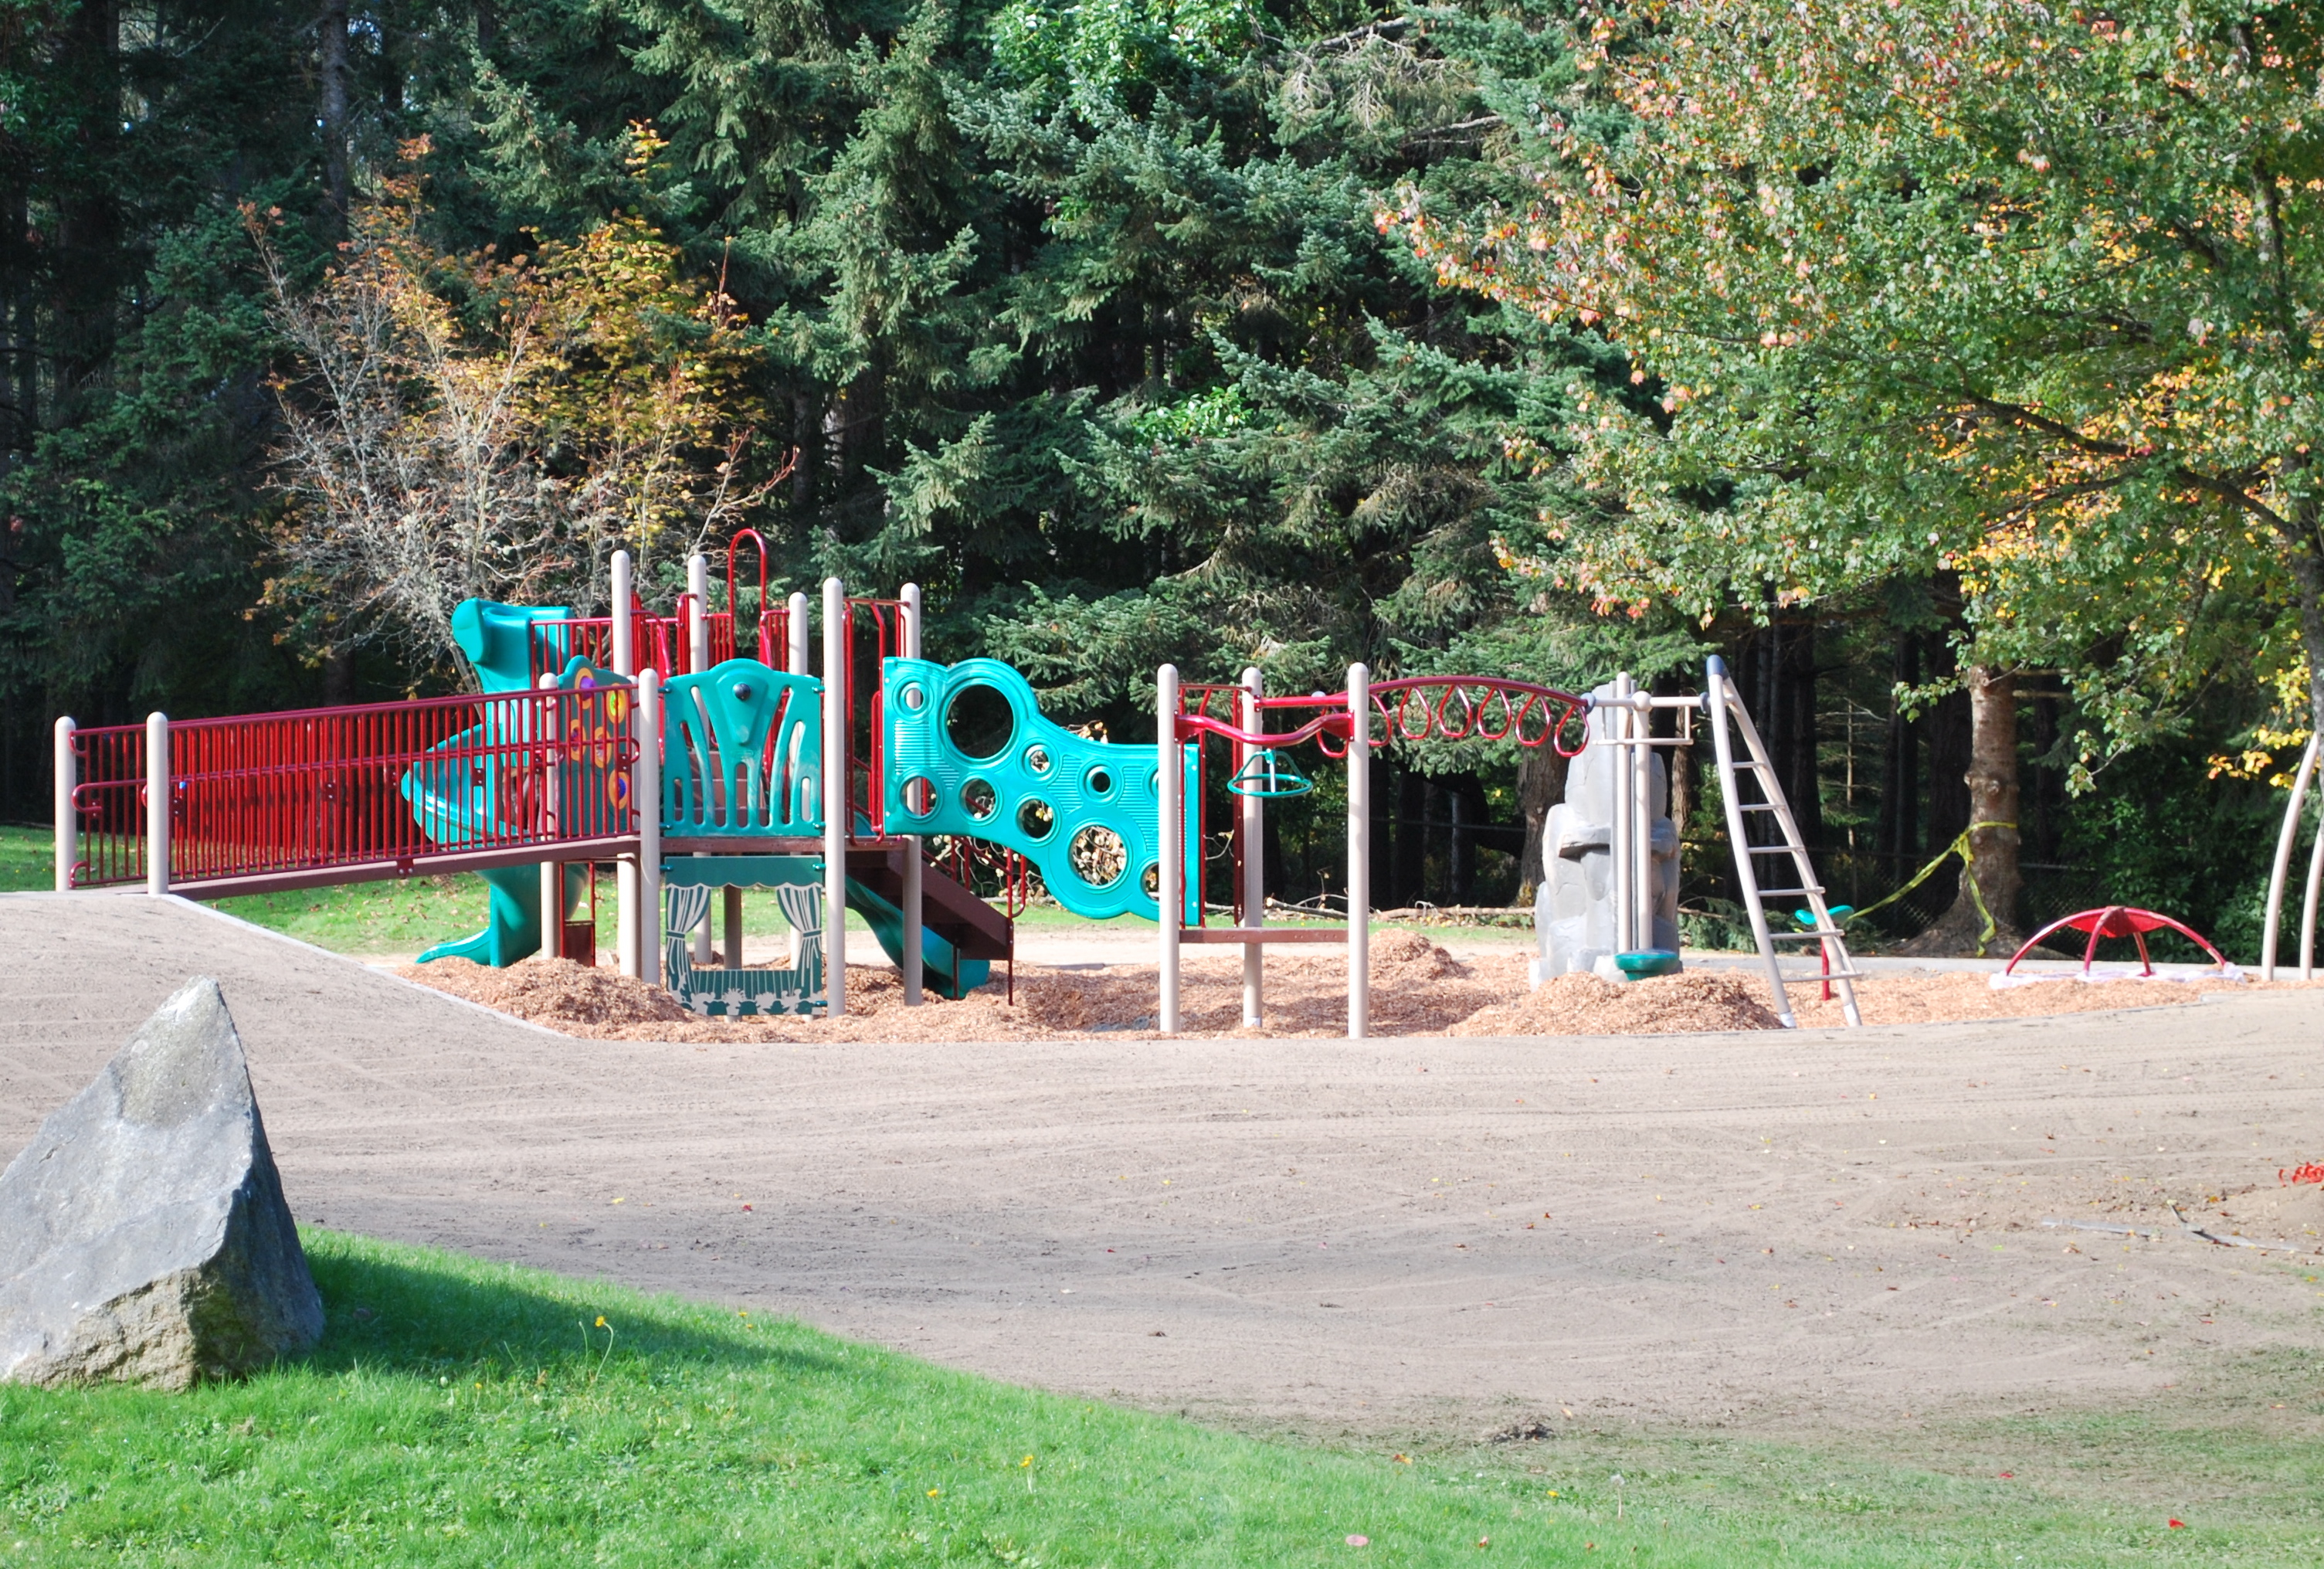 Eagledale Park on Bainbridge Island. The off-leash dog park.